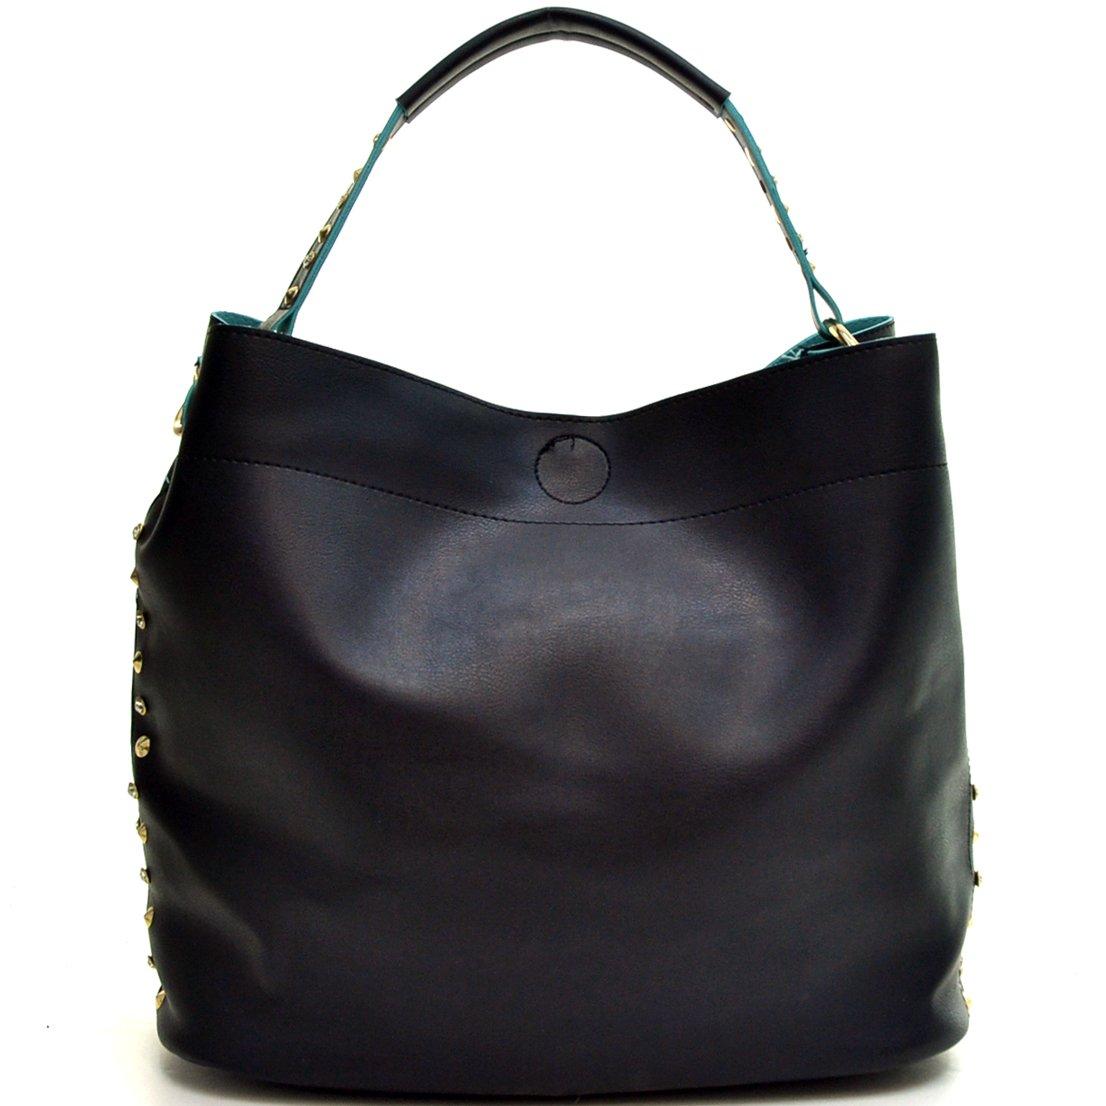 Amazon.com  Dasein Faux Leather Studded 2-in-1 Hobo Shoulder Bag Handbag -  Black  Shoes dc9be64dff107